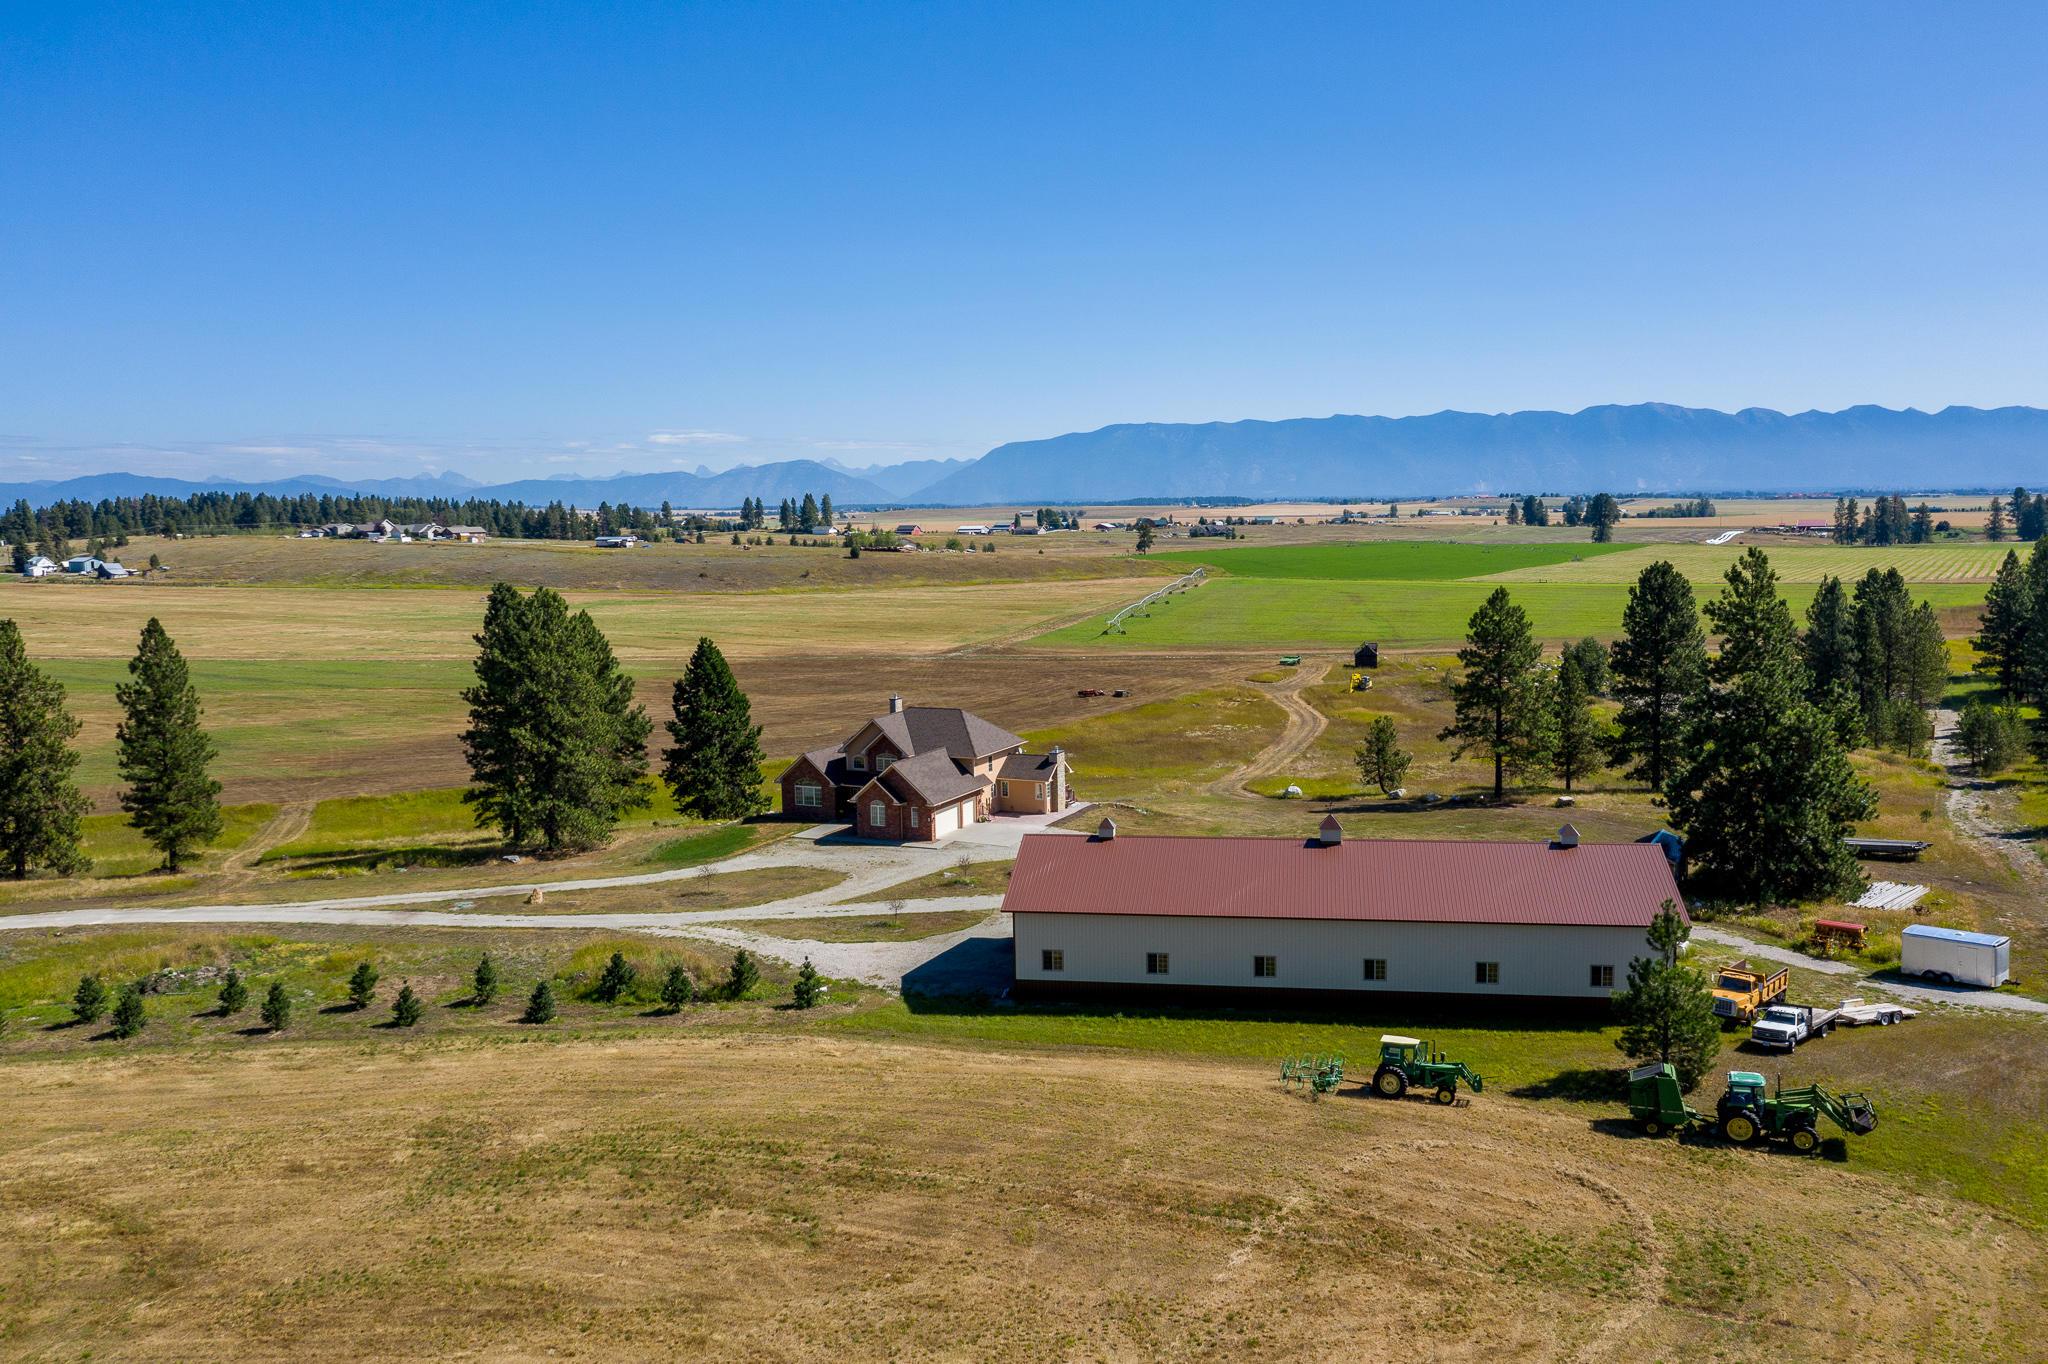 2179 Farm to Market - East Aerial2